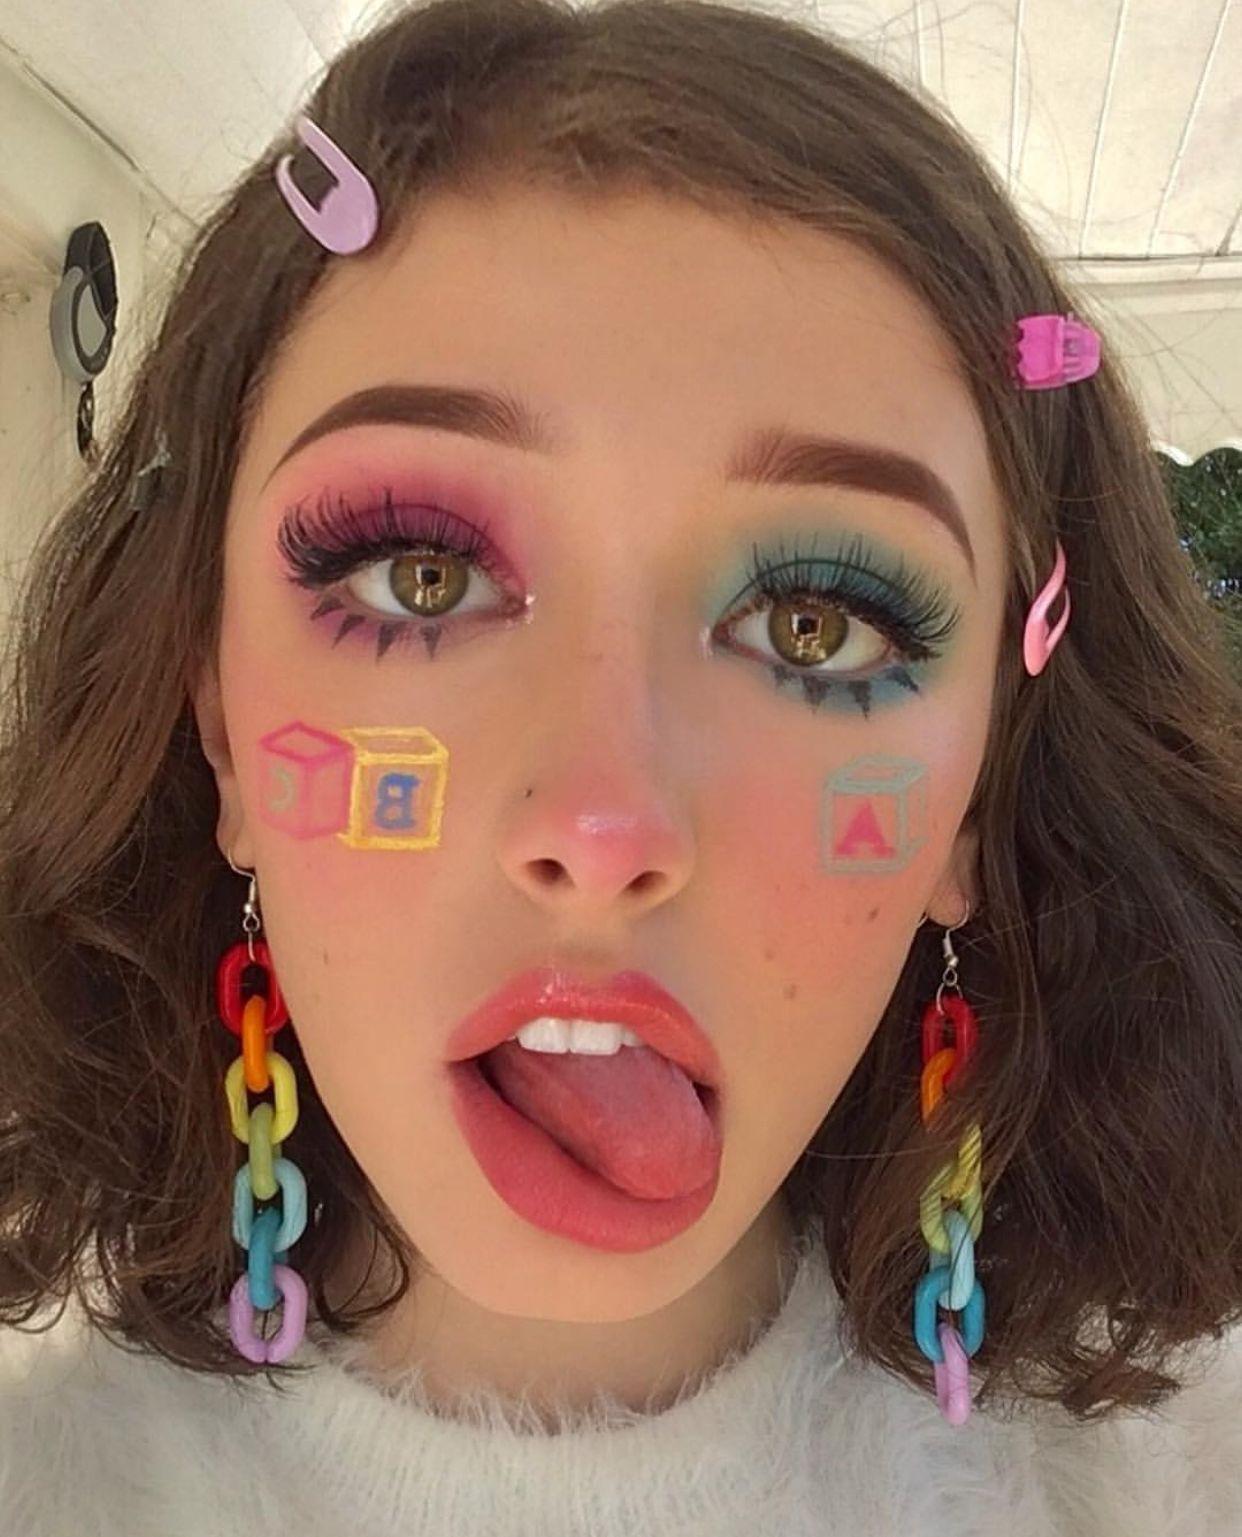 Punk Girl Goth Gothic Aesthetic Cute Pretty Beautiful Beauty Alternative Grunge Eyemakeupdaytime 2020 Cilgin Makyaj Makyaj Sanati Fantastik Makyaj